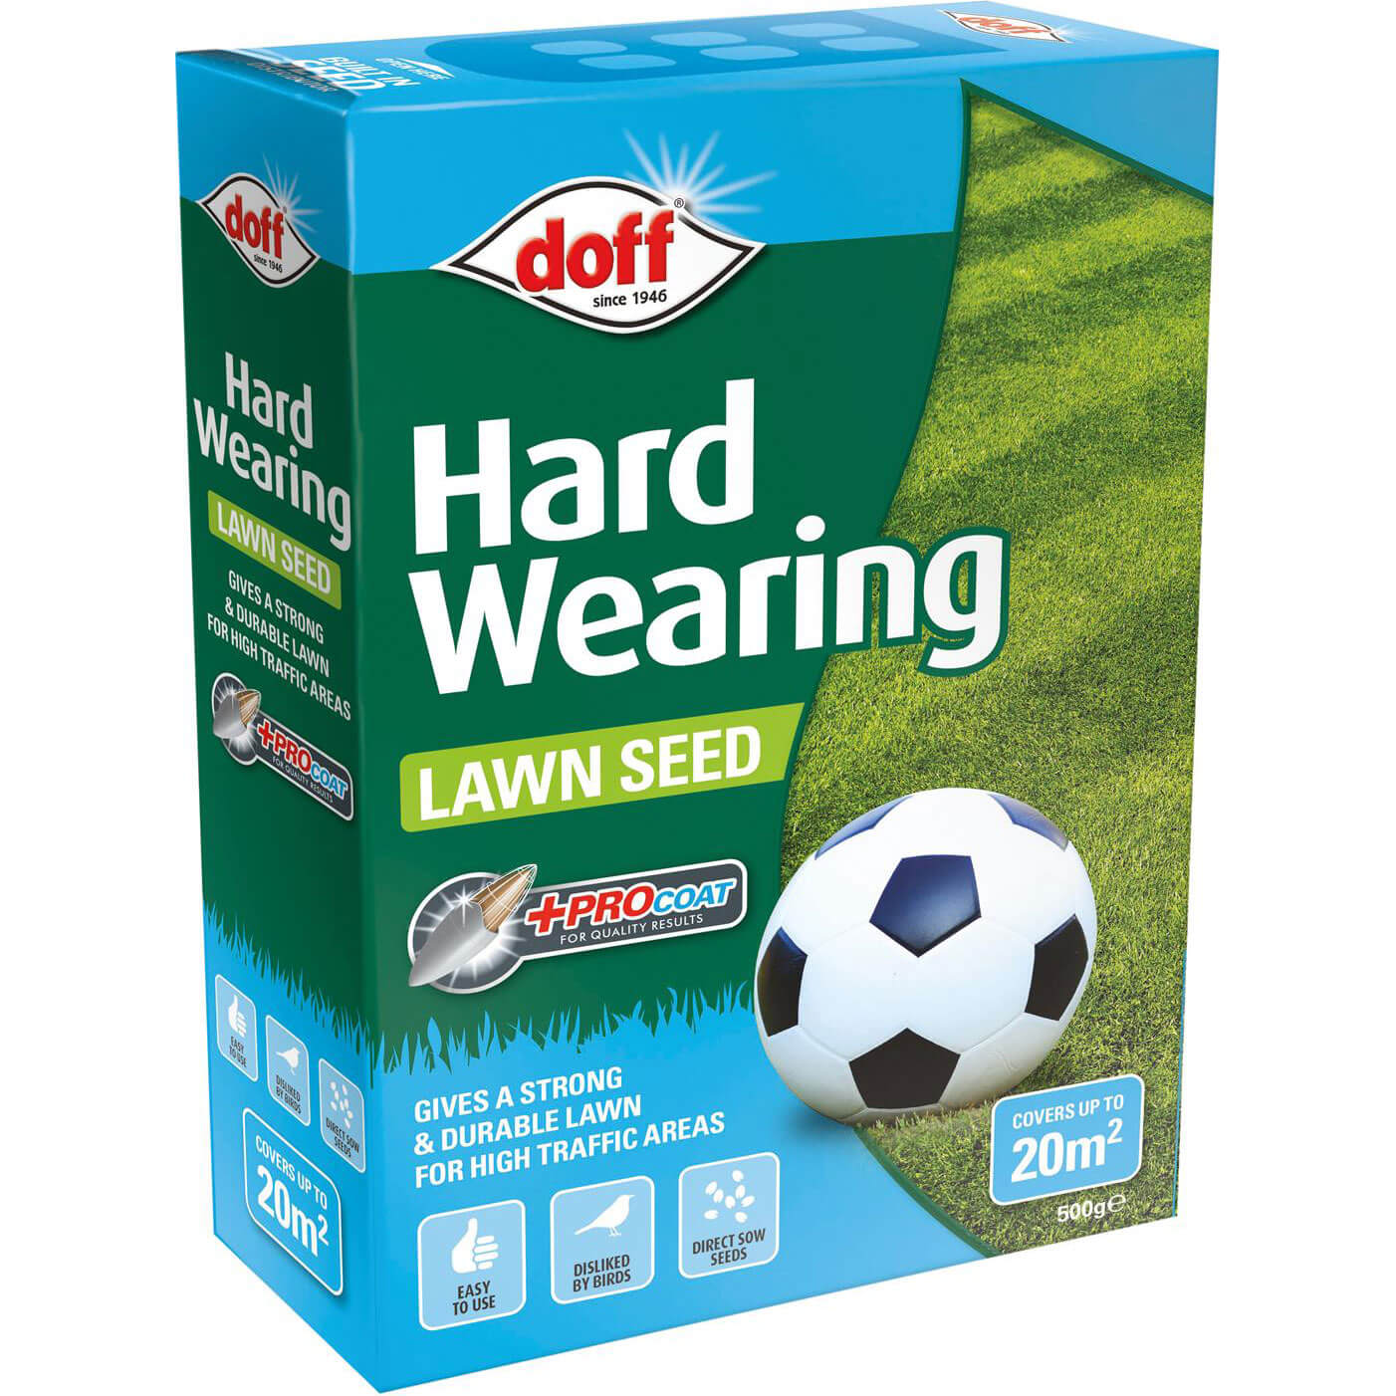 Doff Hard Wearing Lawn Seed